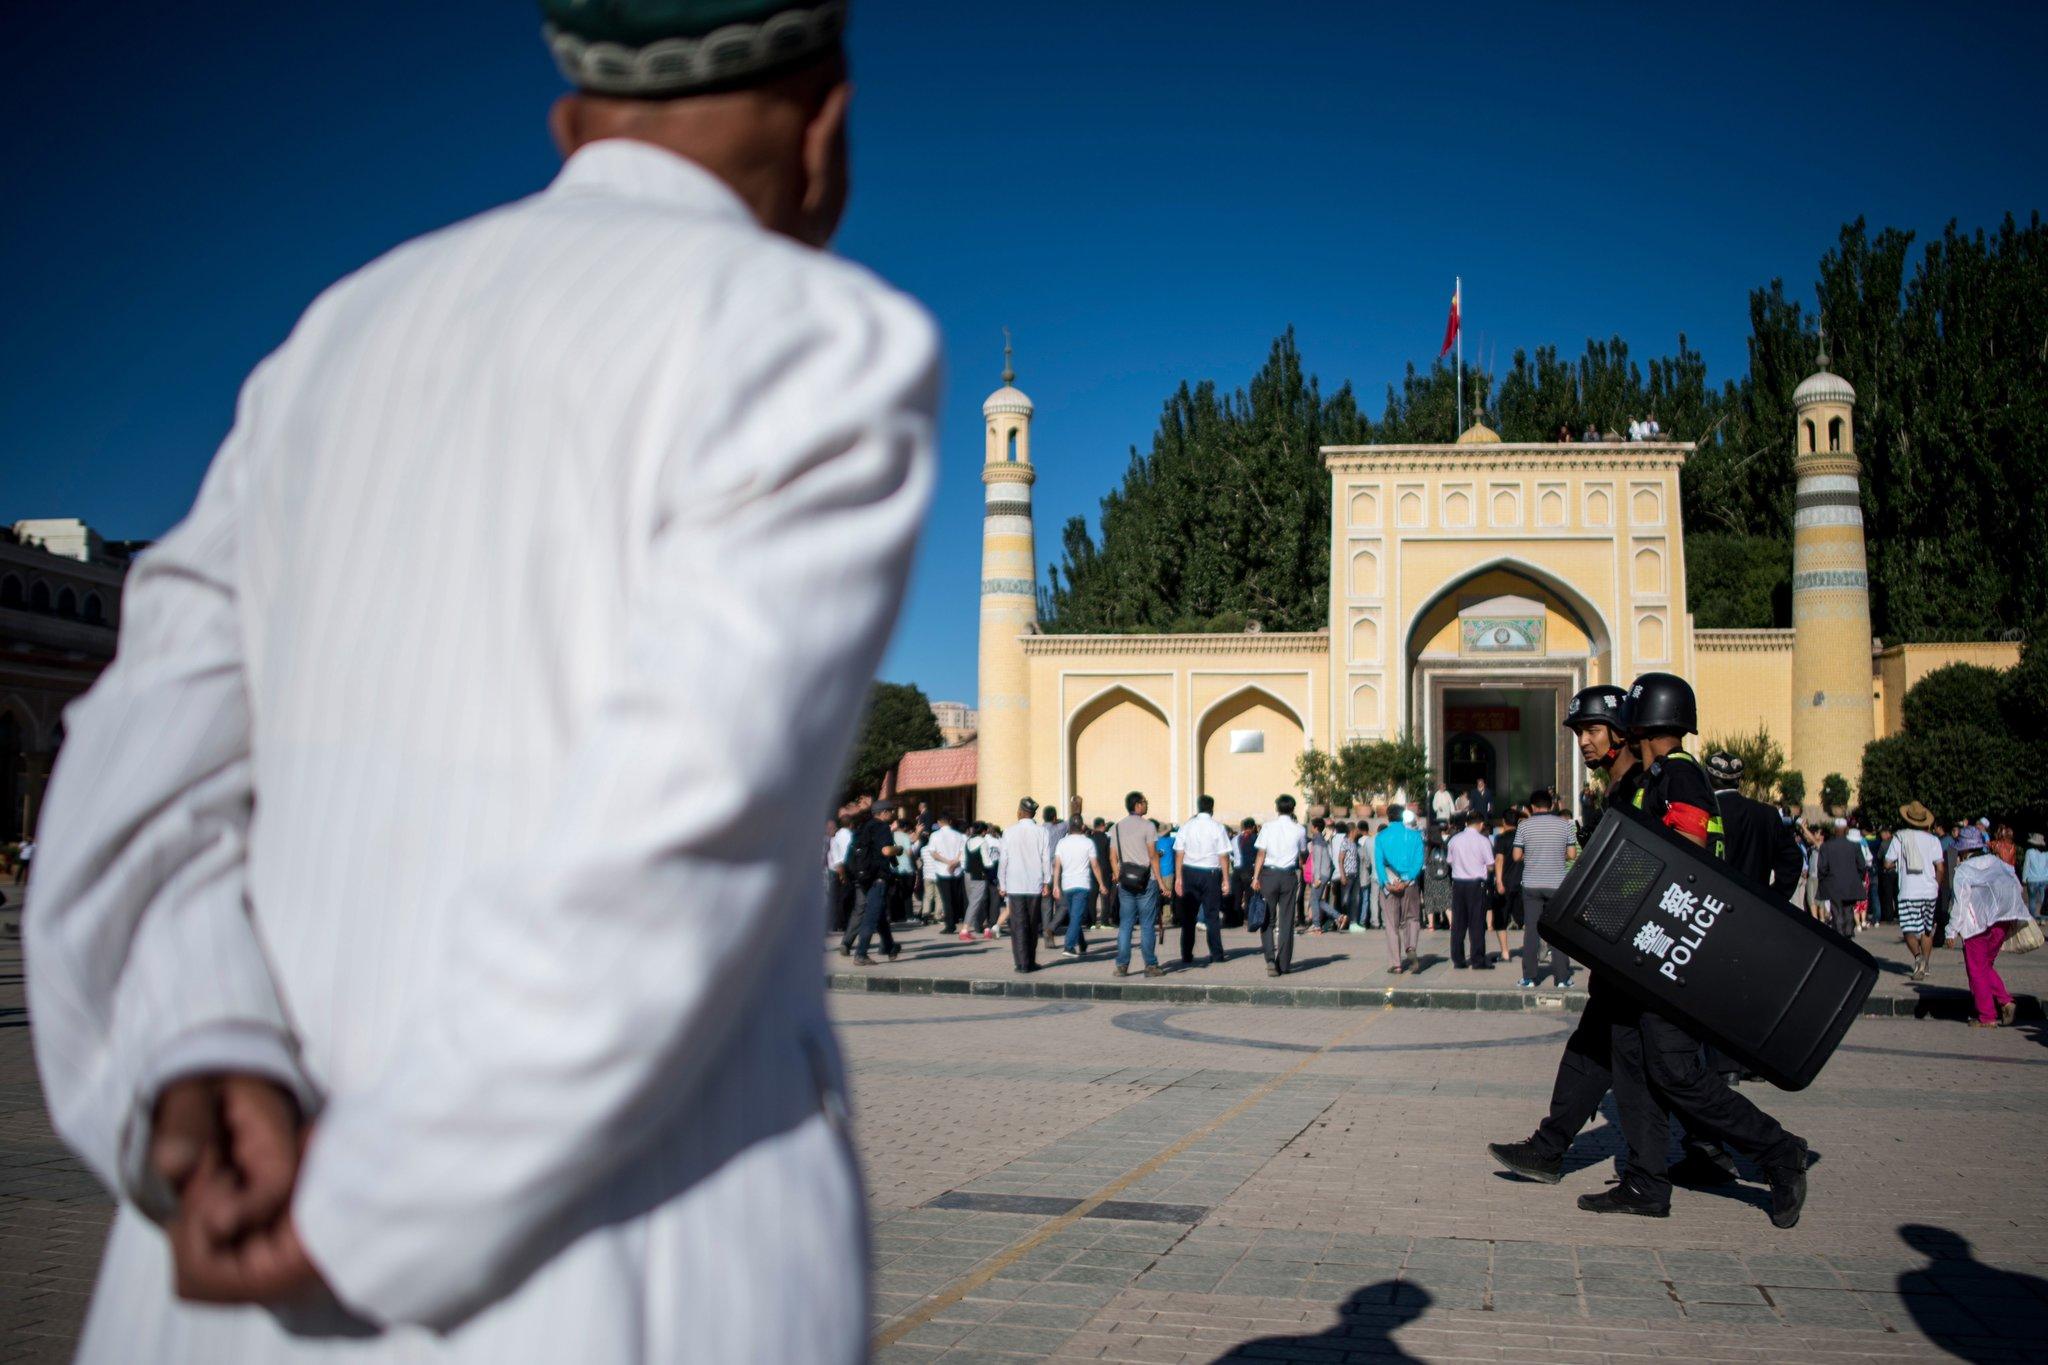 China's Orwellian War on Religion